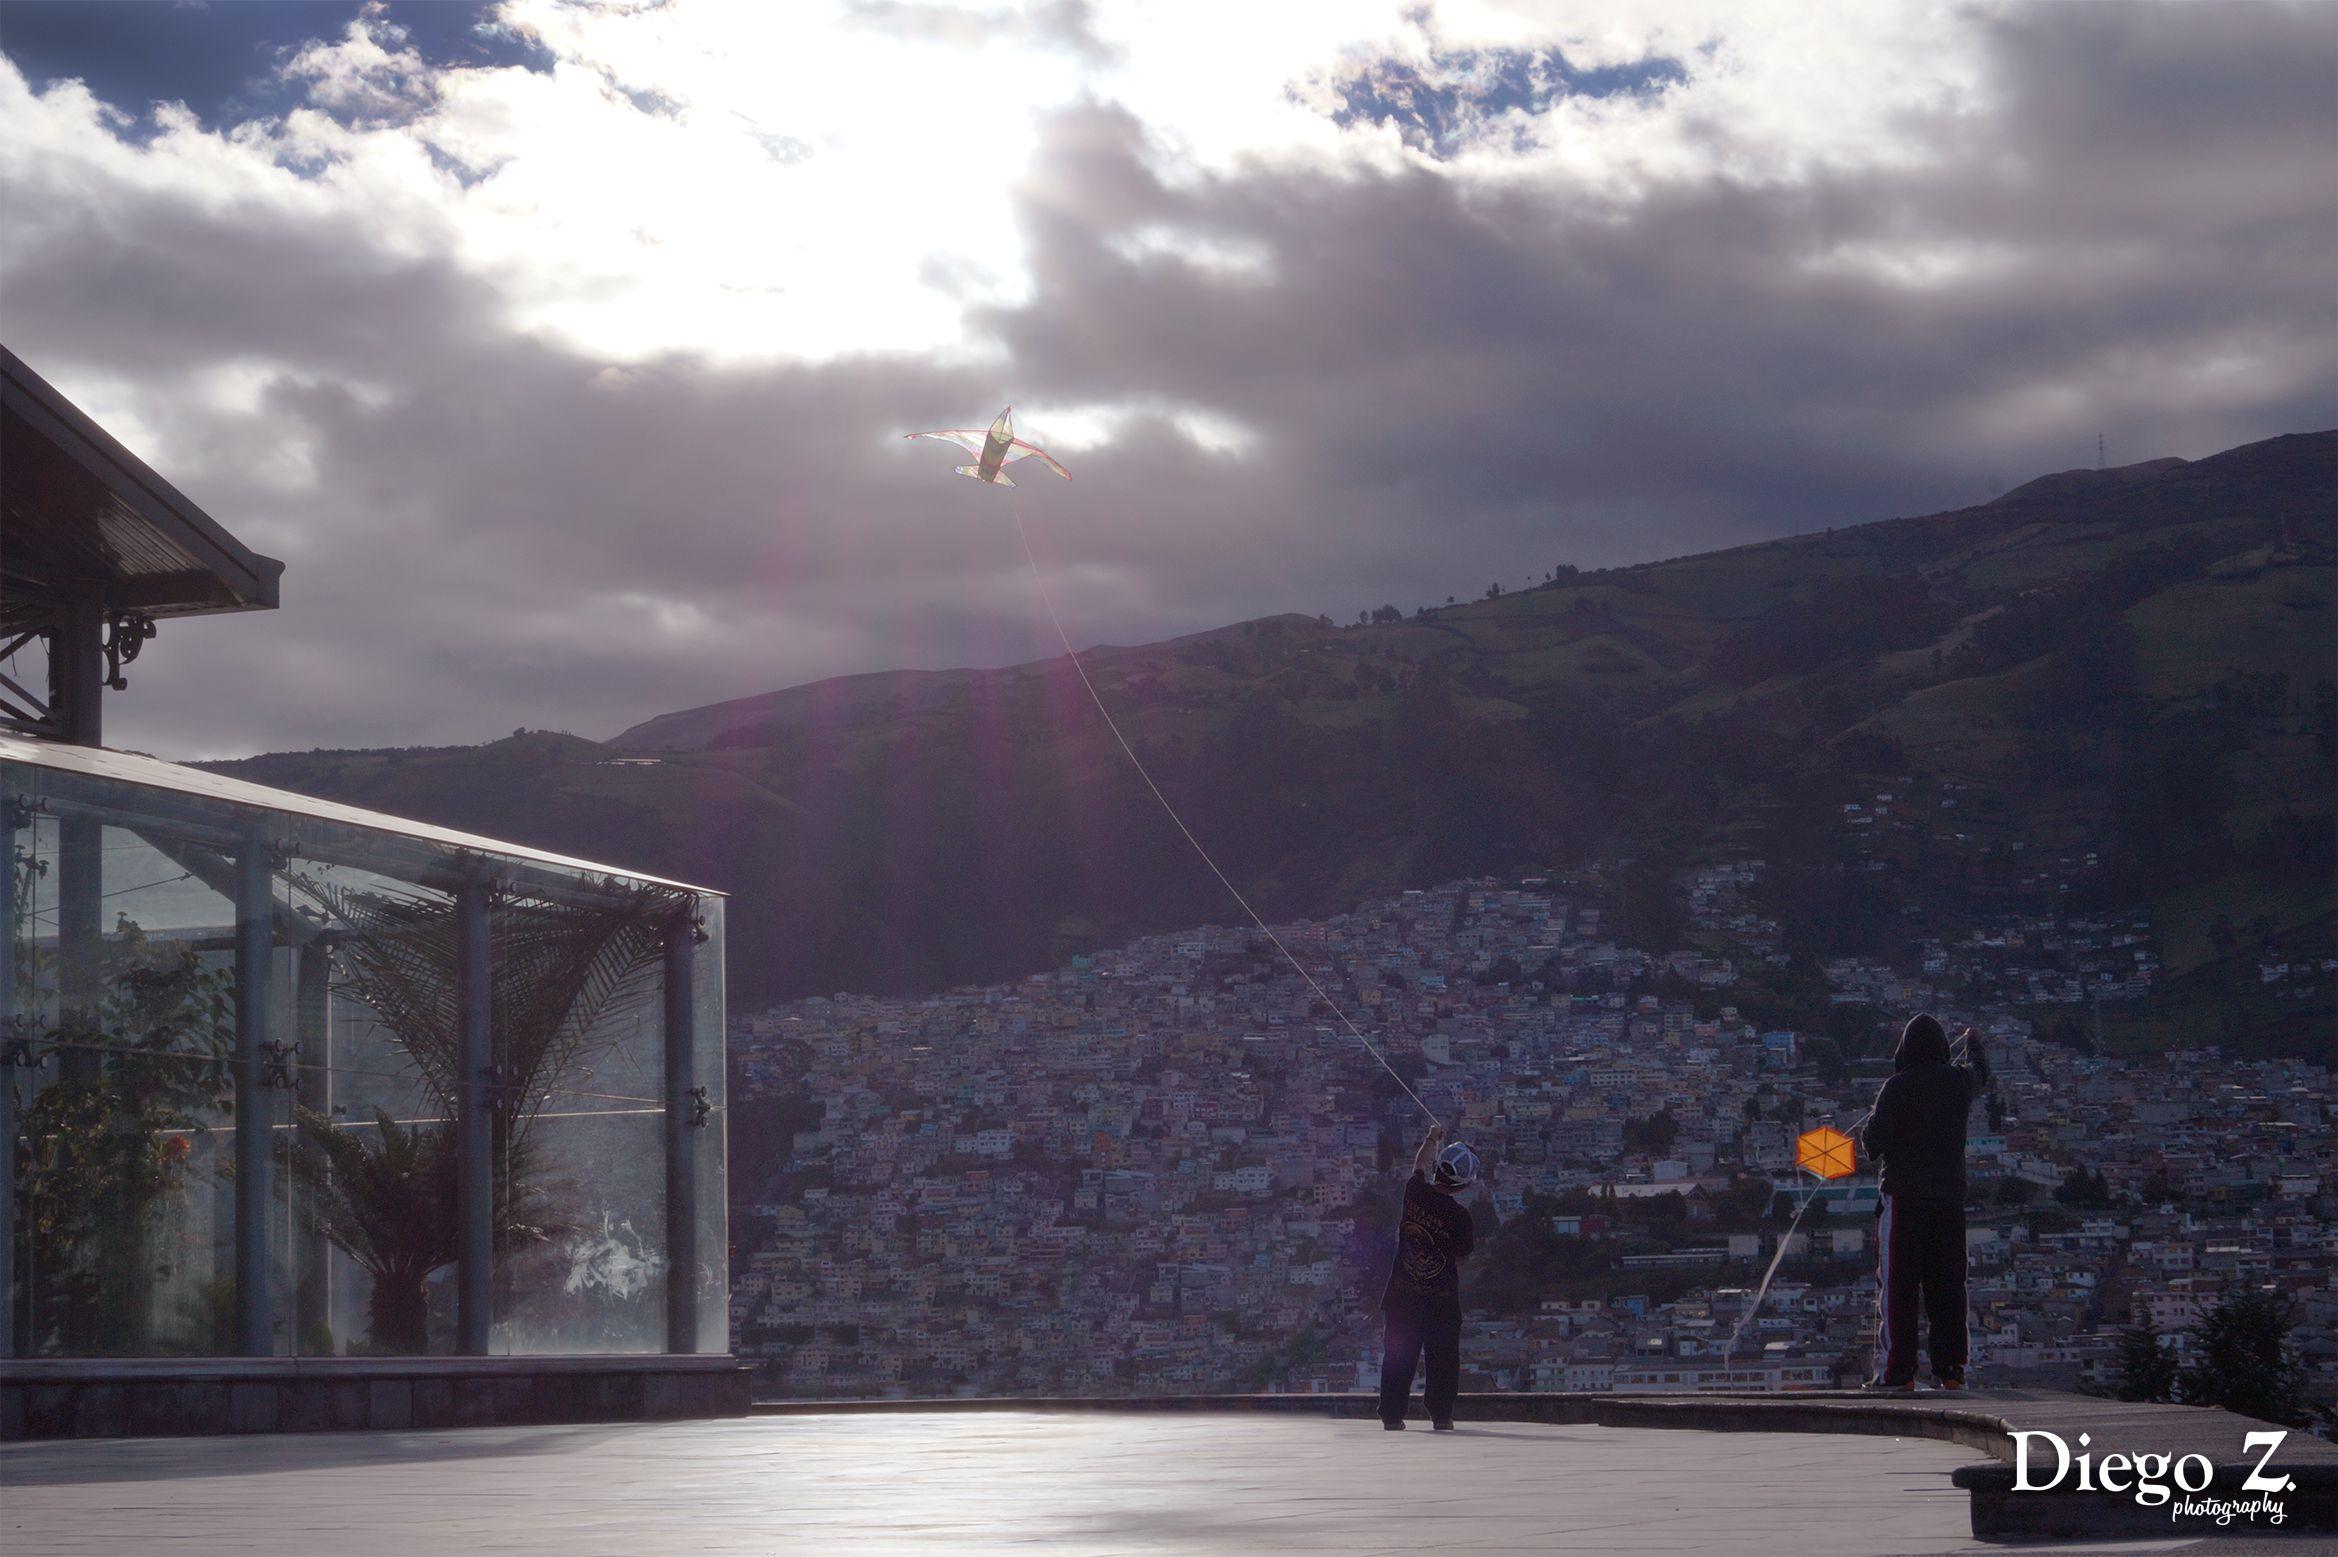 Volando Una Cometa Parque Itchimbia Quito Ecuador 2017